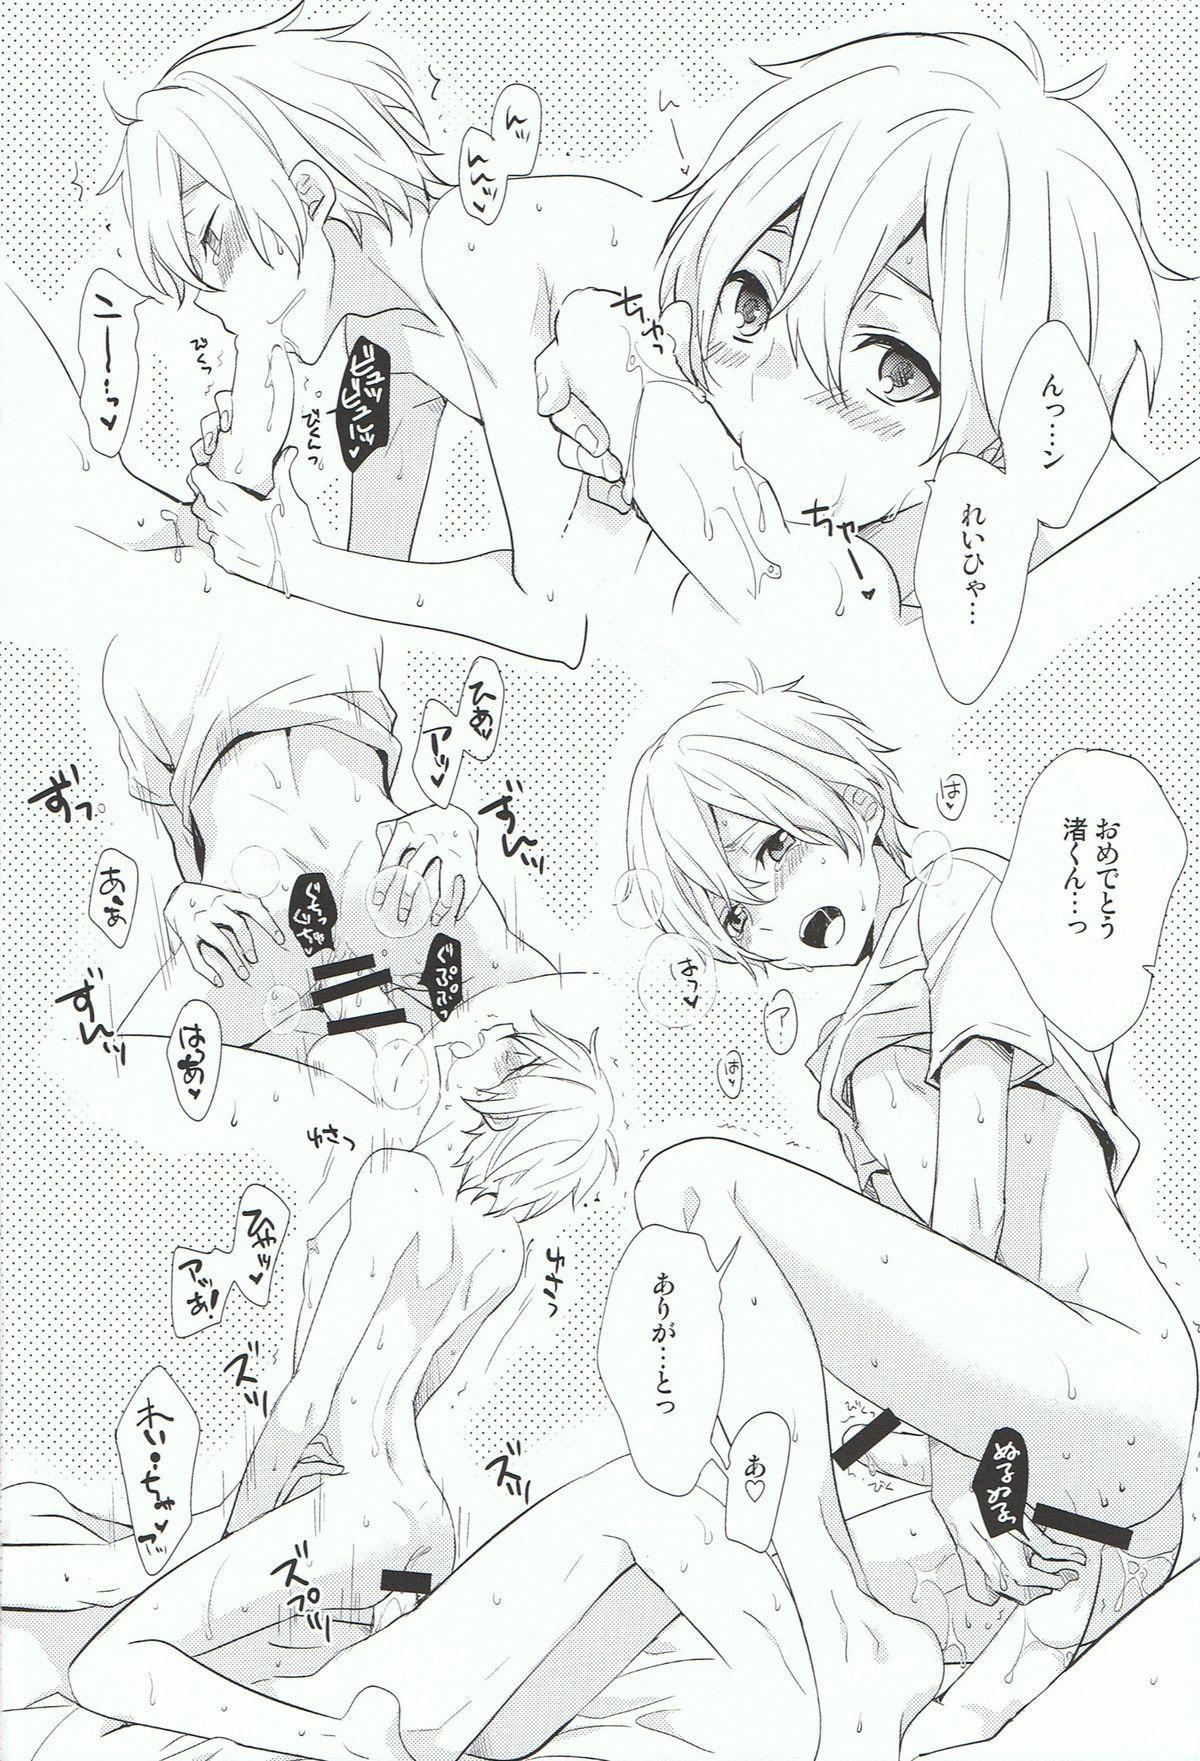 Nagisa-kun de ii deshou! 6